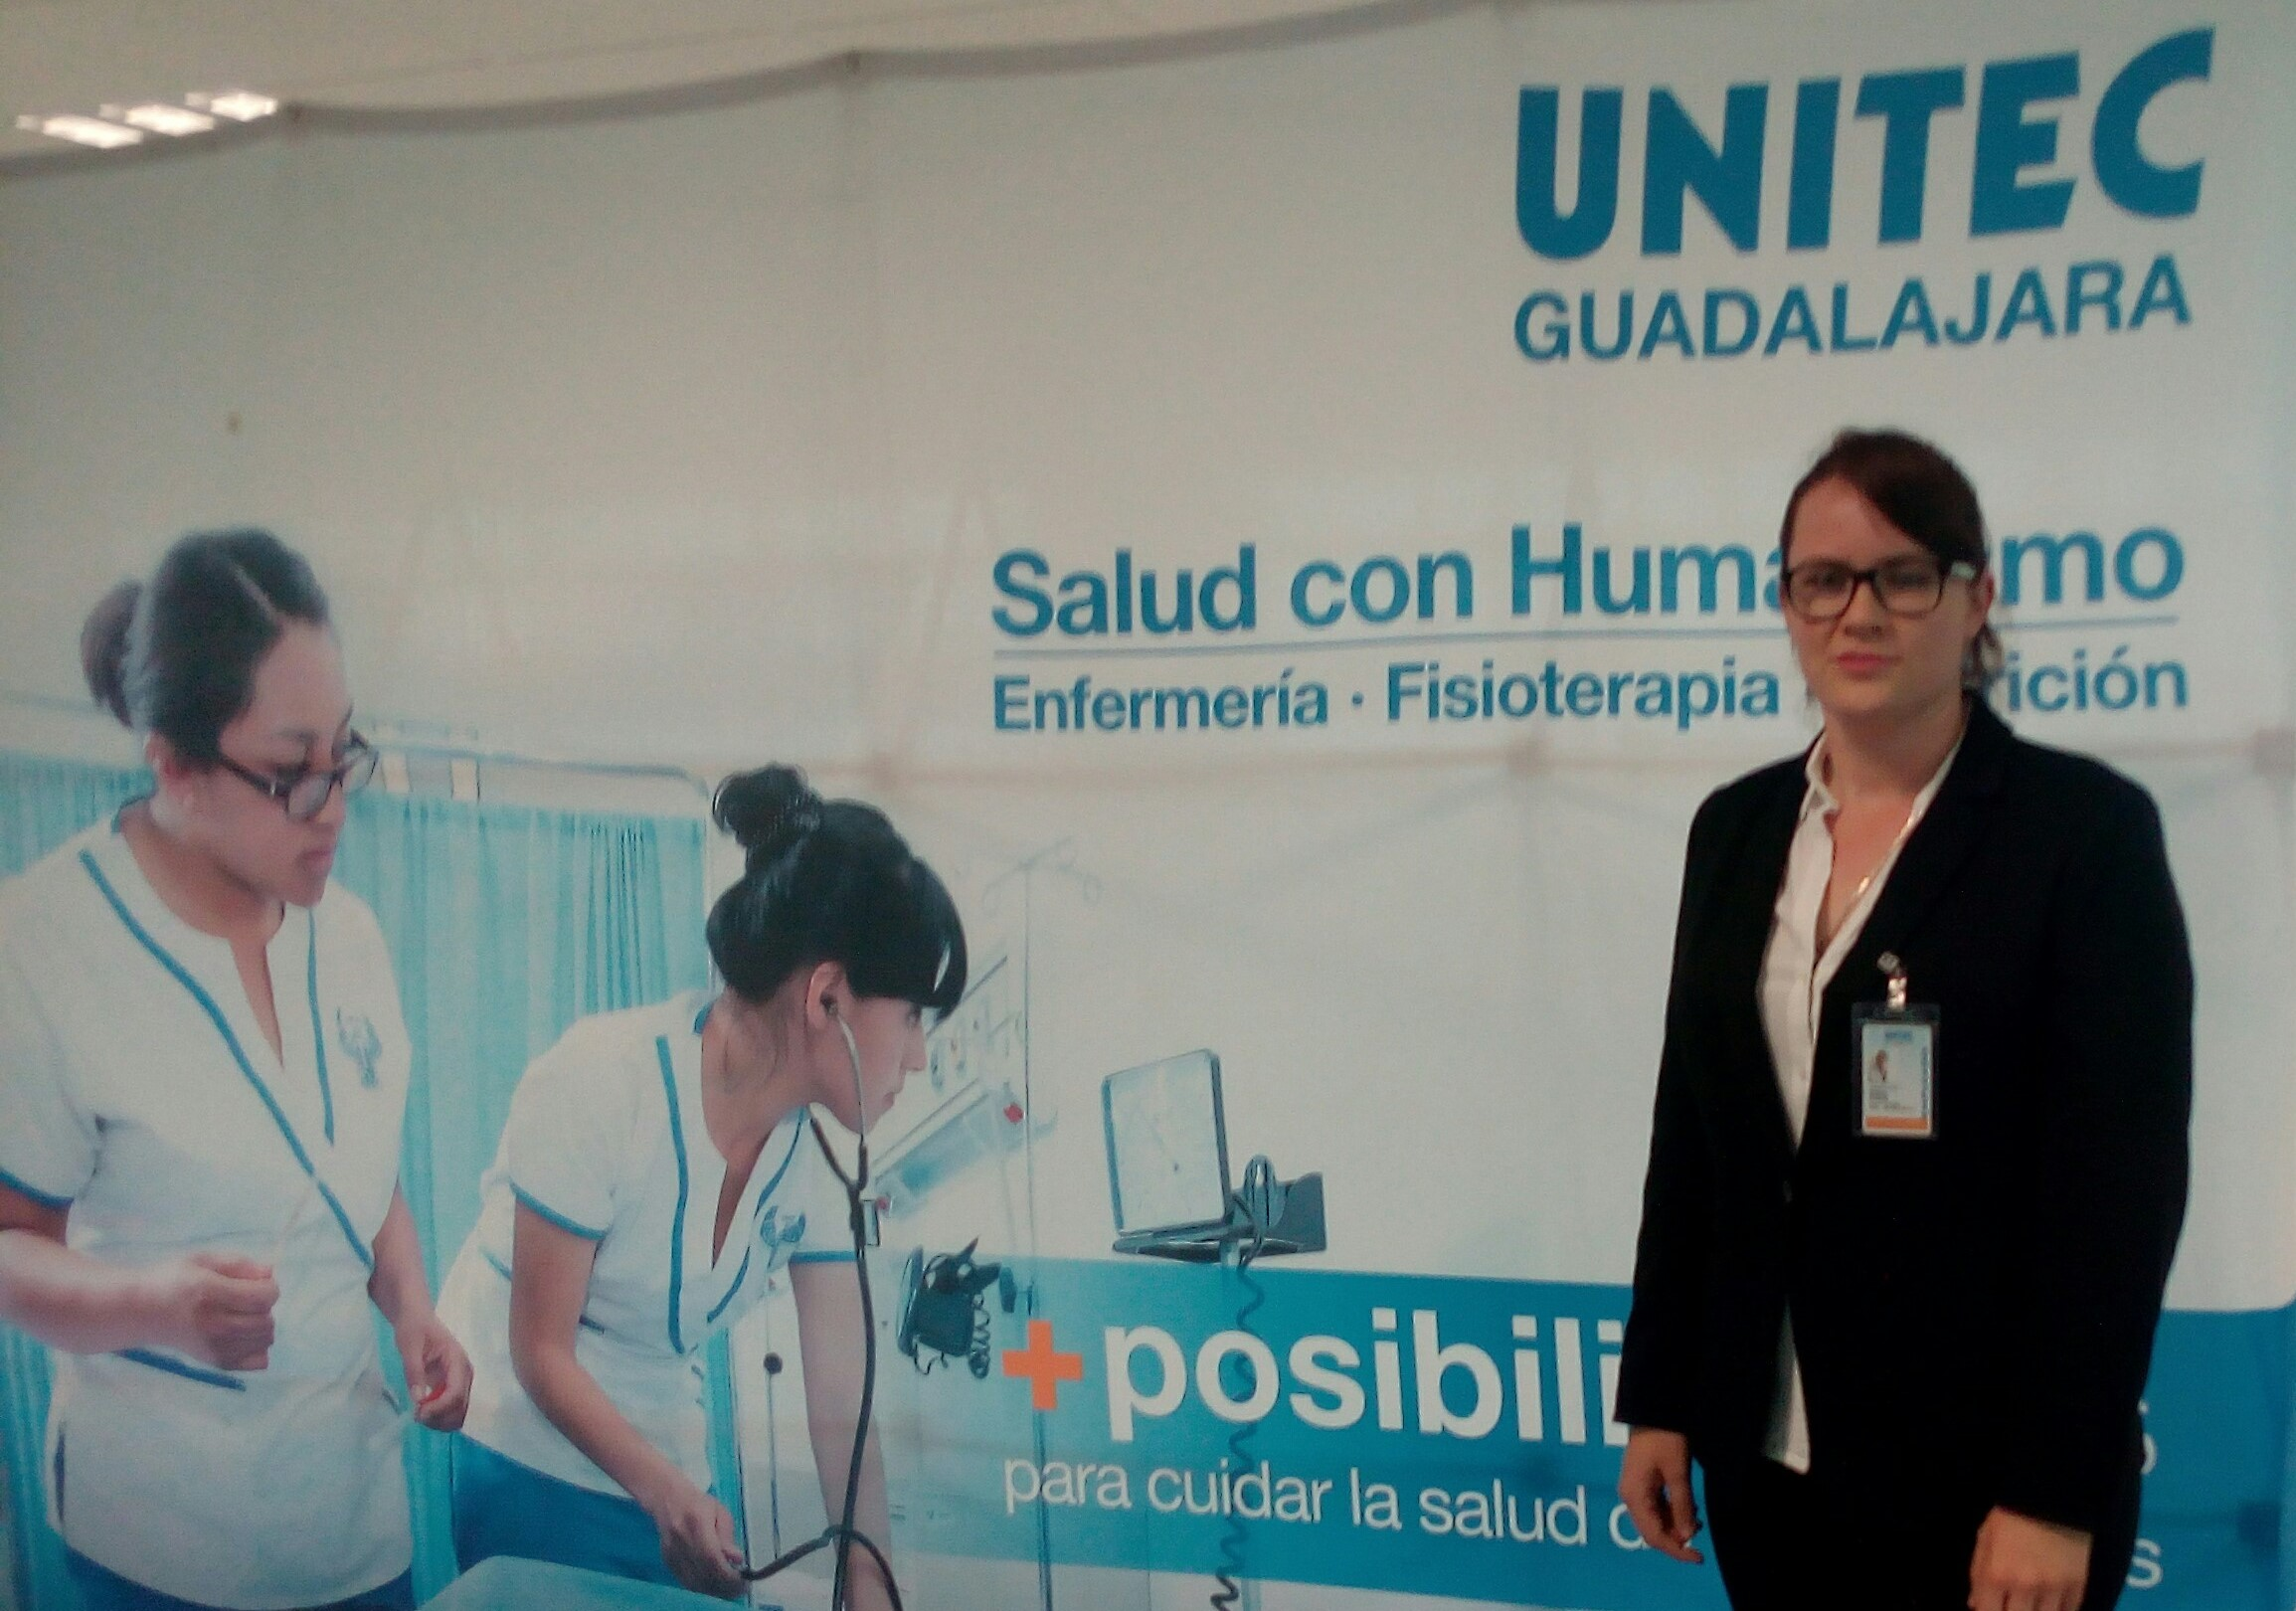 UNITEC Guadalajara organiza la 2ª. Semana de la Salud - Featured Image